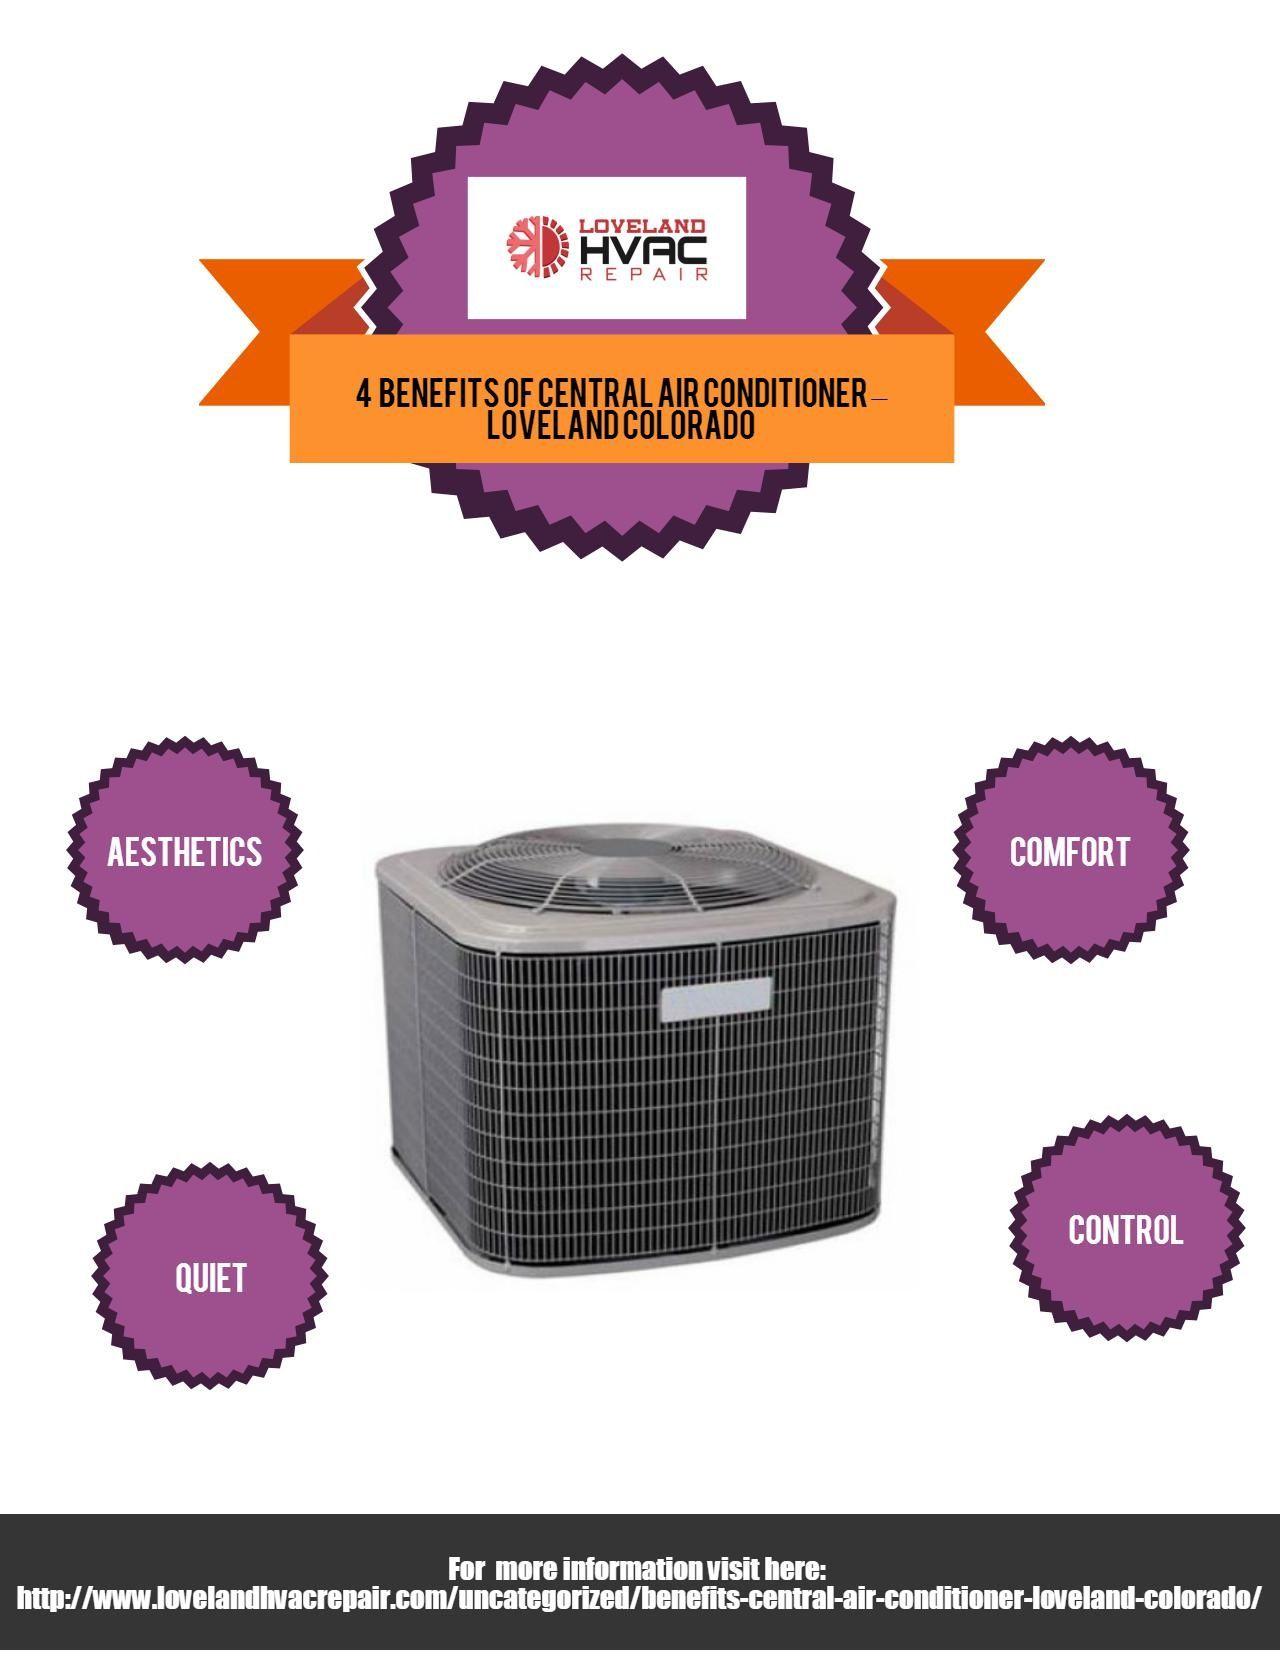 Benefits of Central Air Conditioner Loveland Colorado